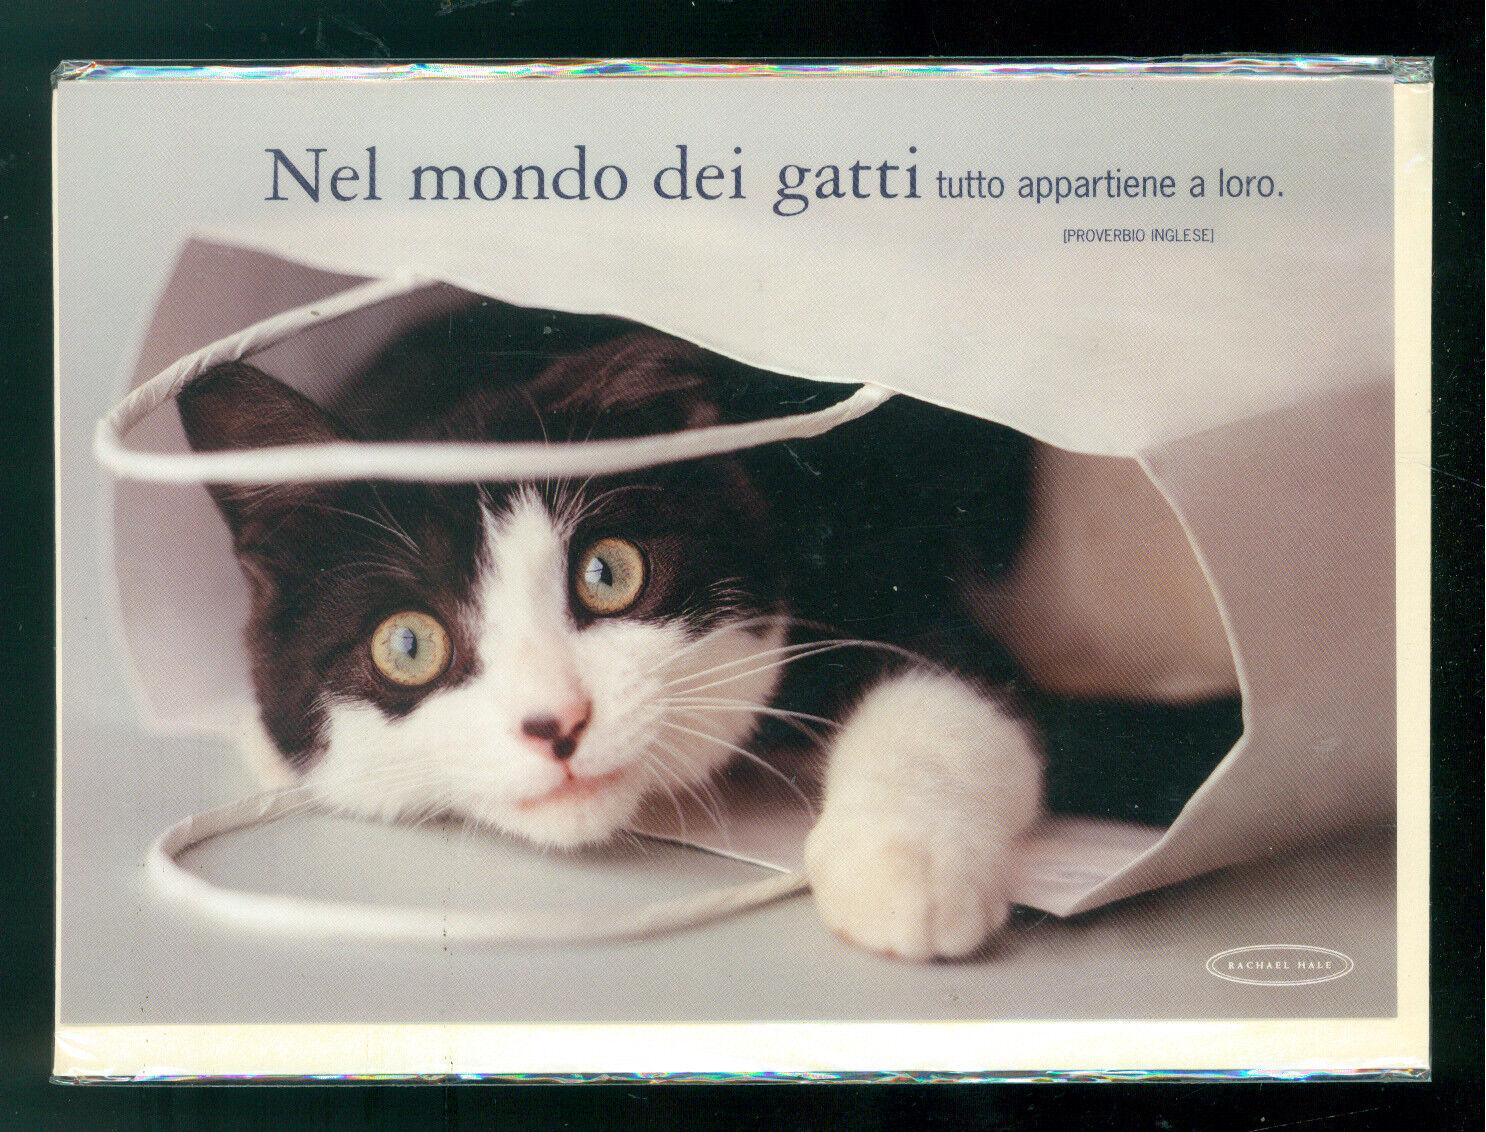 RACHAEL HALE BIGLIETTO AUGURI GIFT CARD MEDIO GATTO CAT 2004 CLAYTON